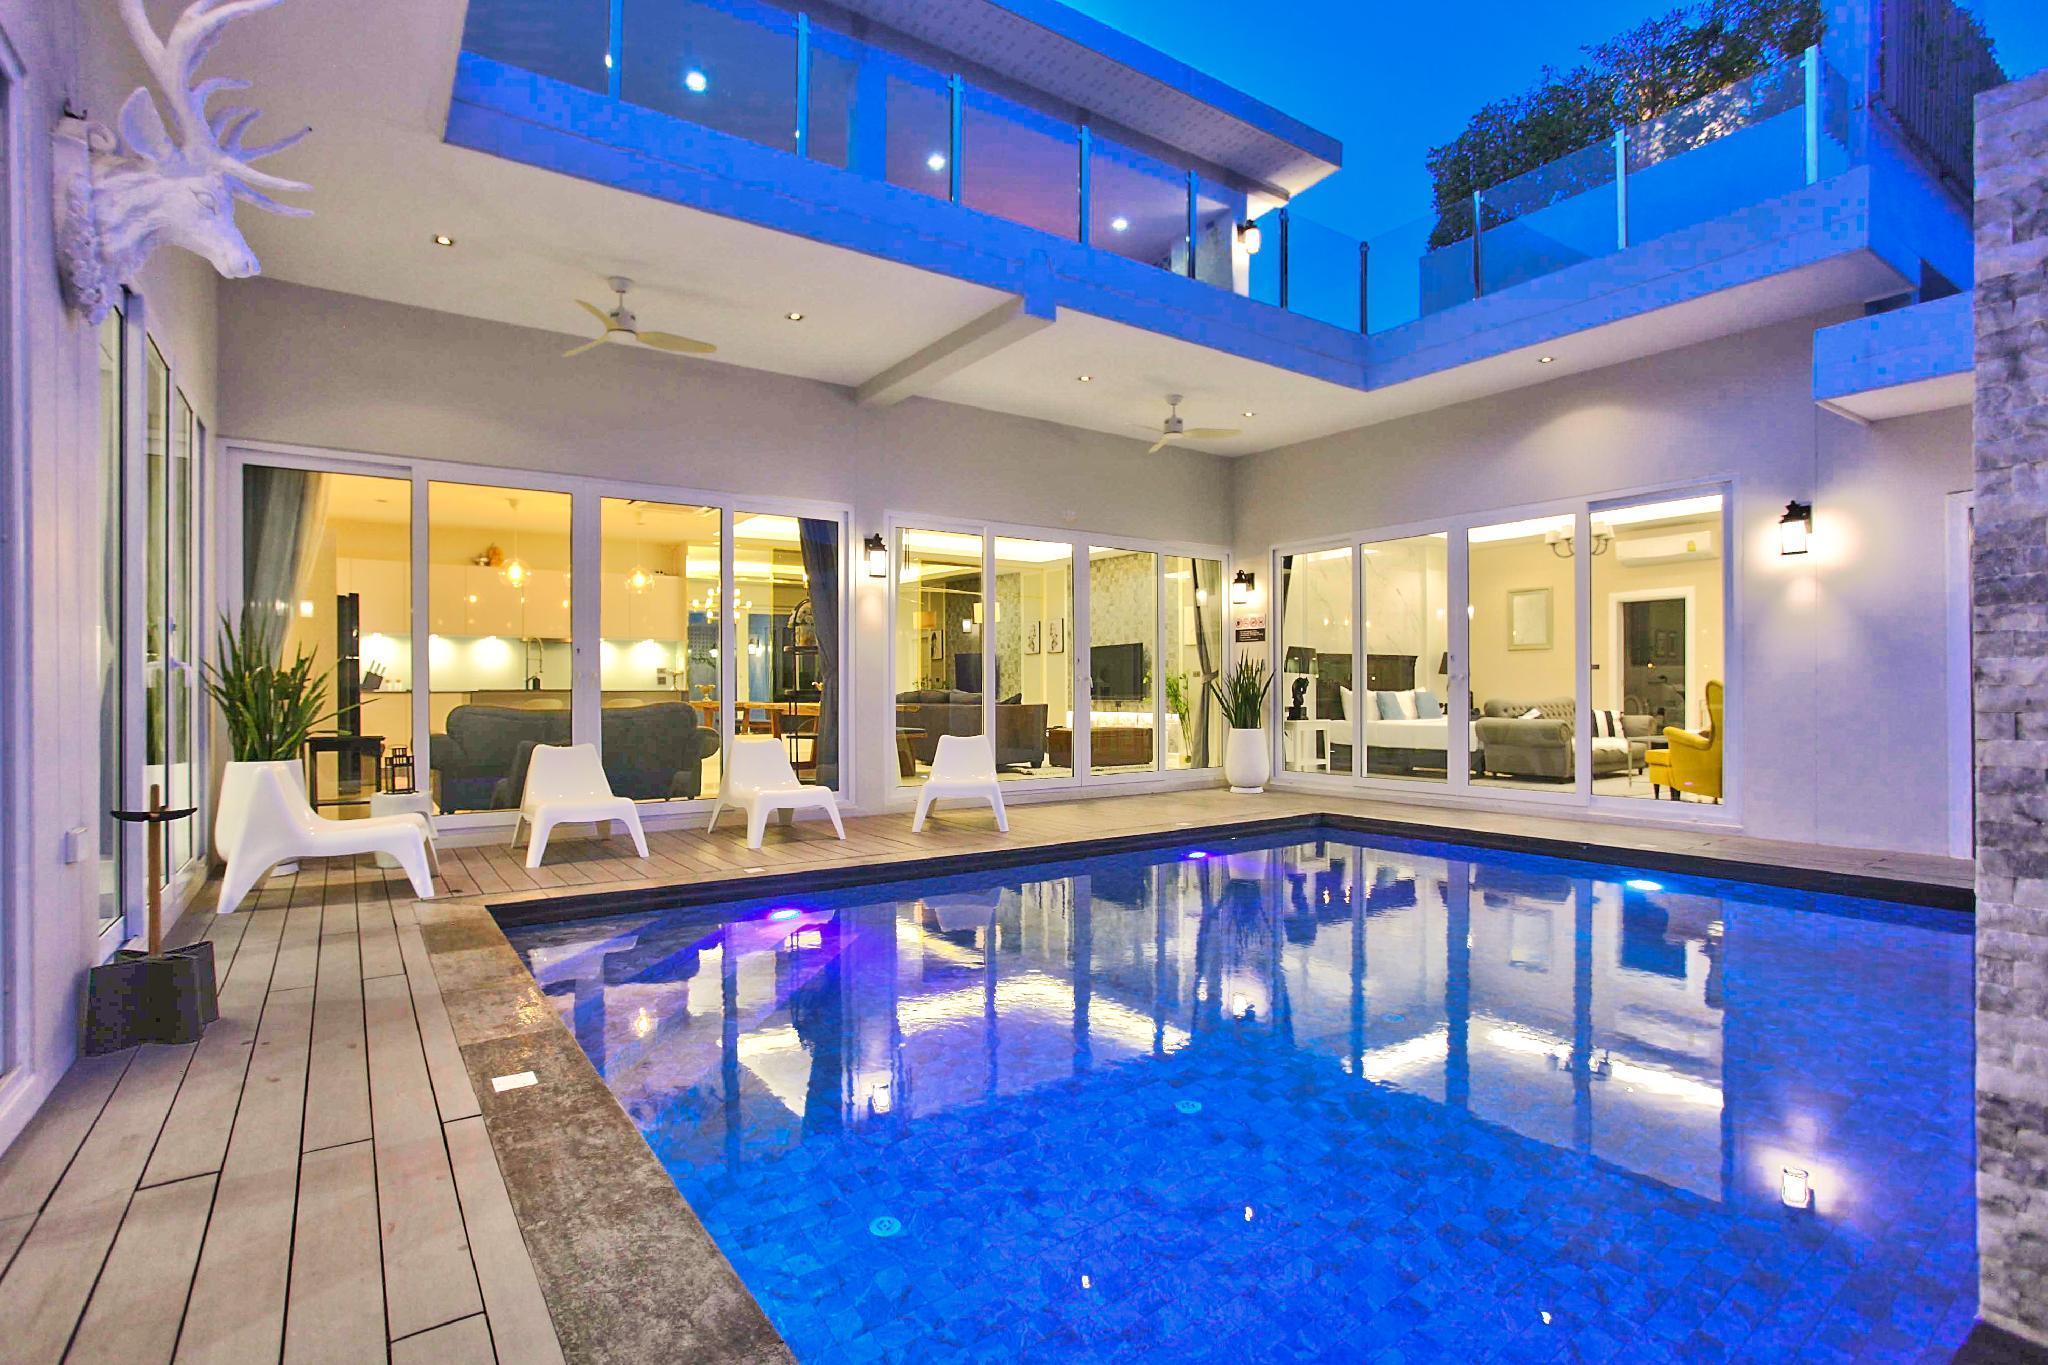 Luxury Pool Villa Pattaya - ViewPoint วิลลา 5 ห้องนอน 7 ห้องน้ำส่วนตัว ขนาด 360 ตร.ม. – หาดจอมเทียน